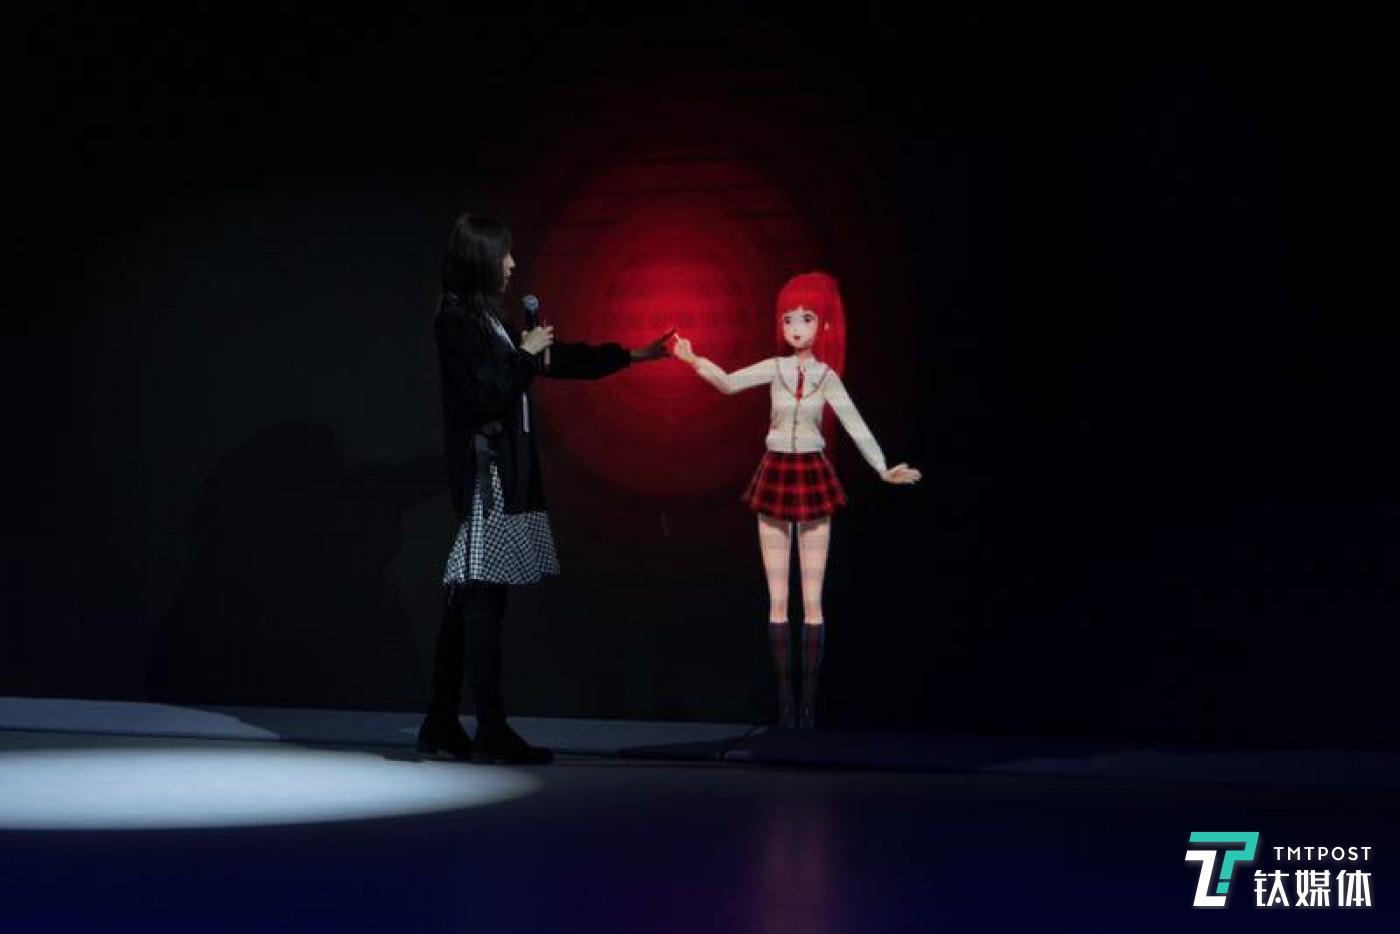 Touchlive:与虚拟偶像的指尖相触